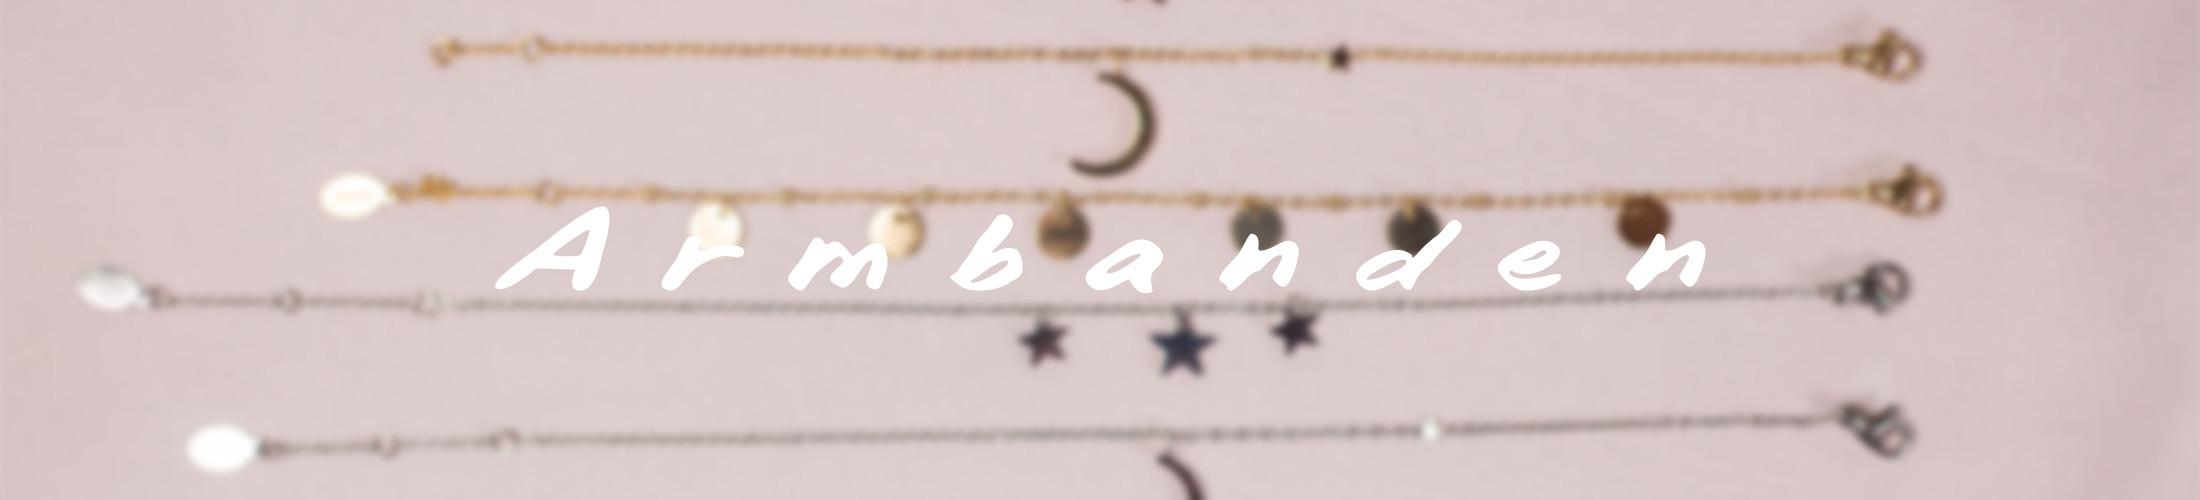 Armbanden Banner